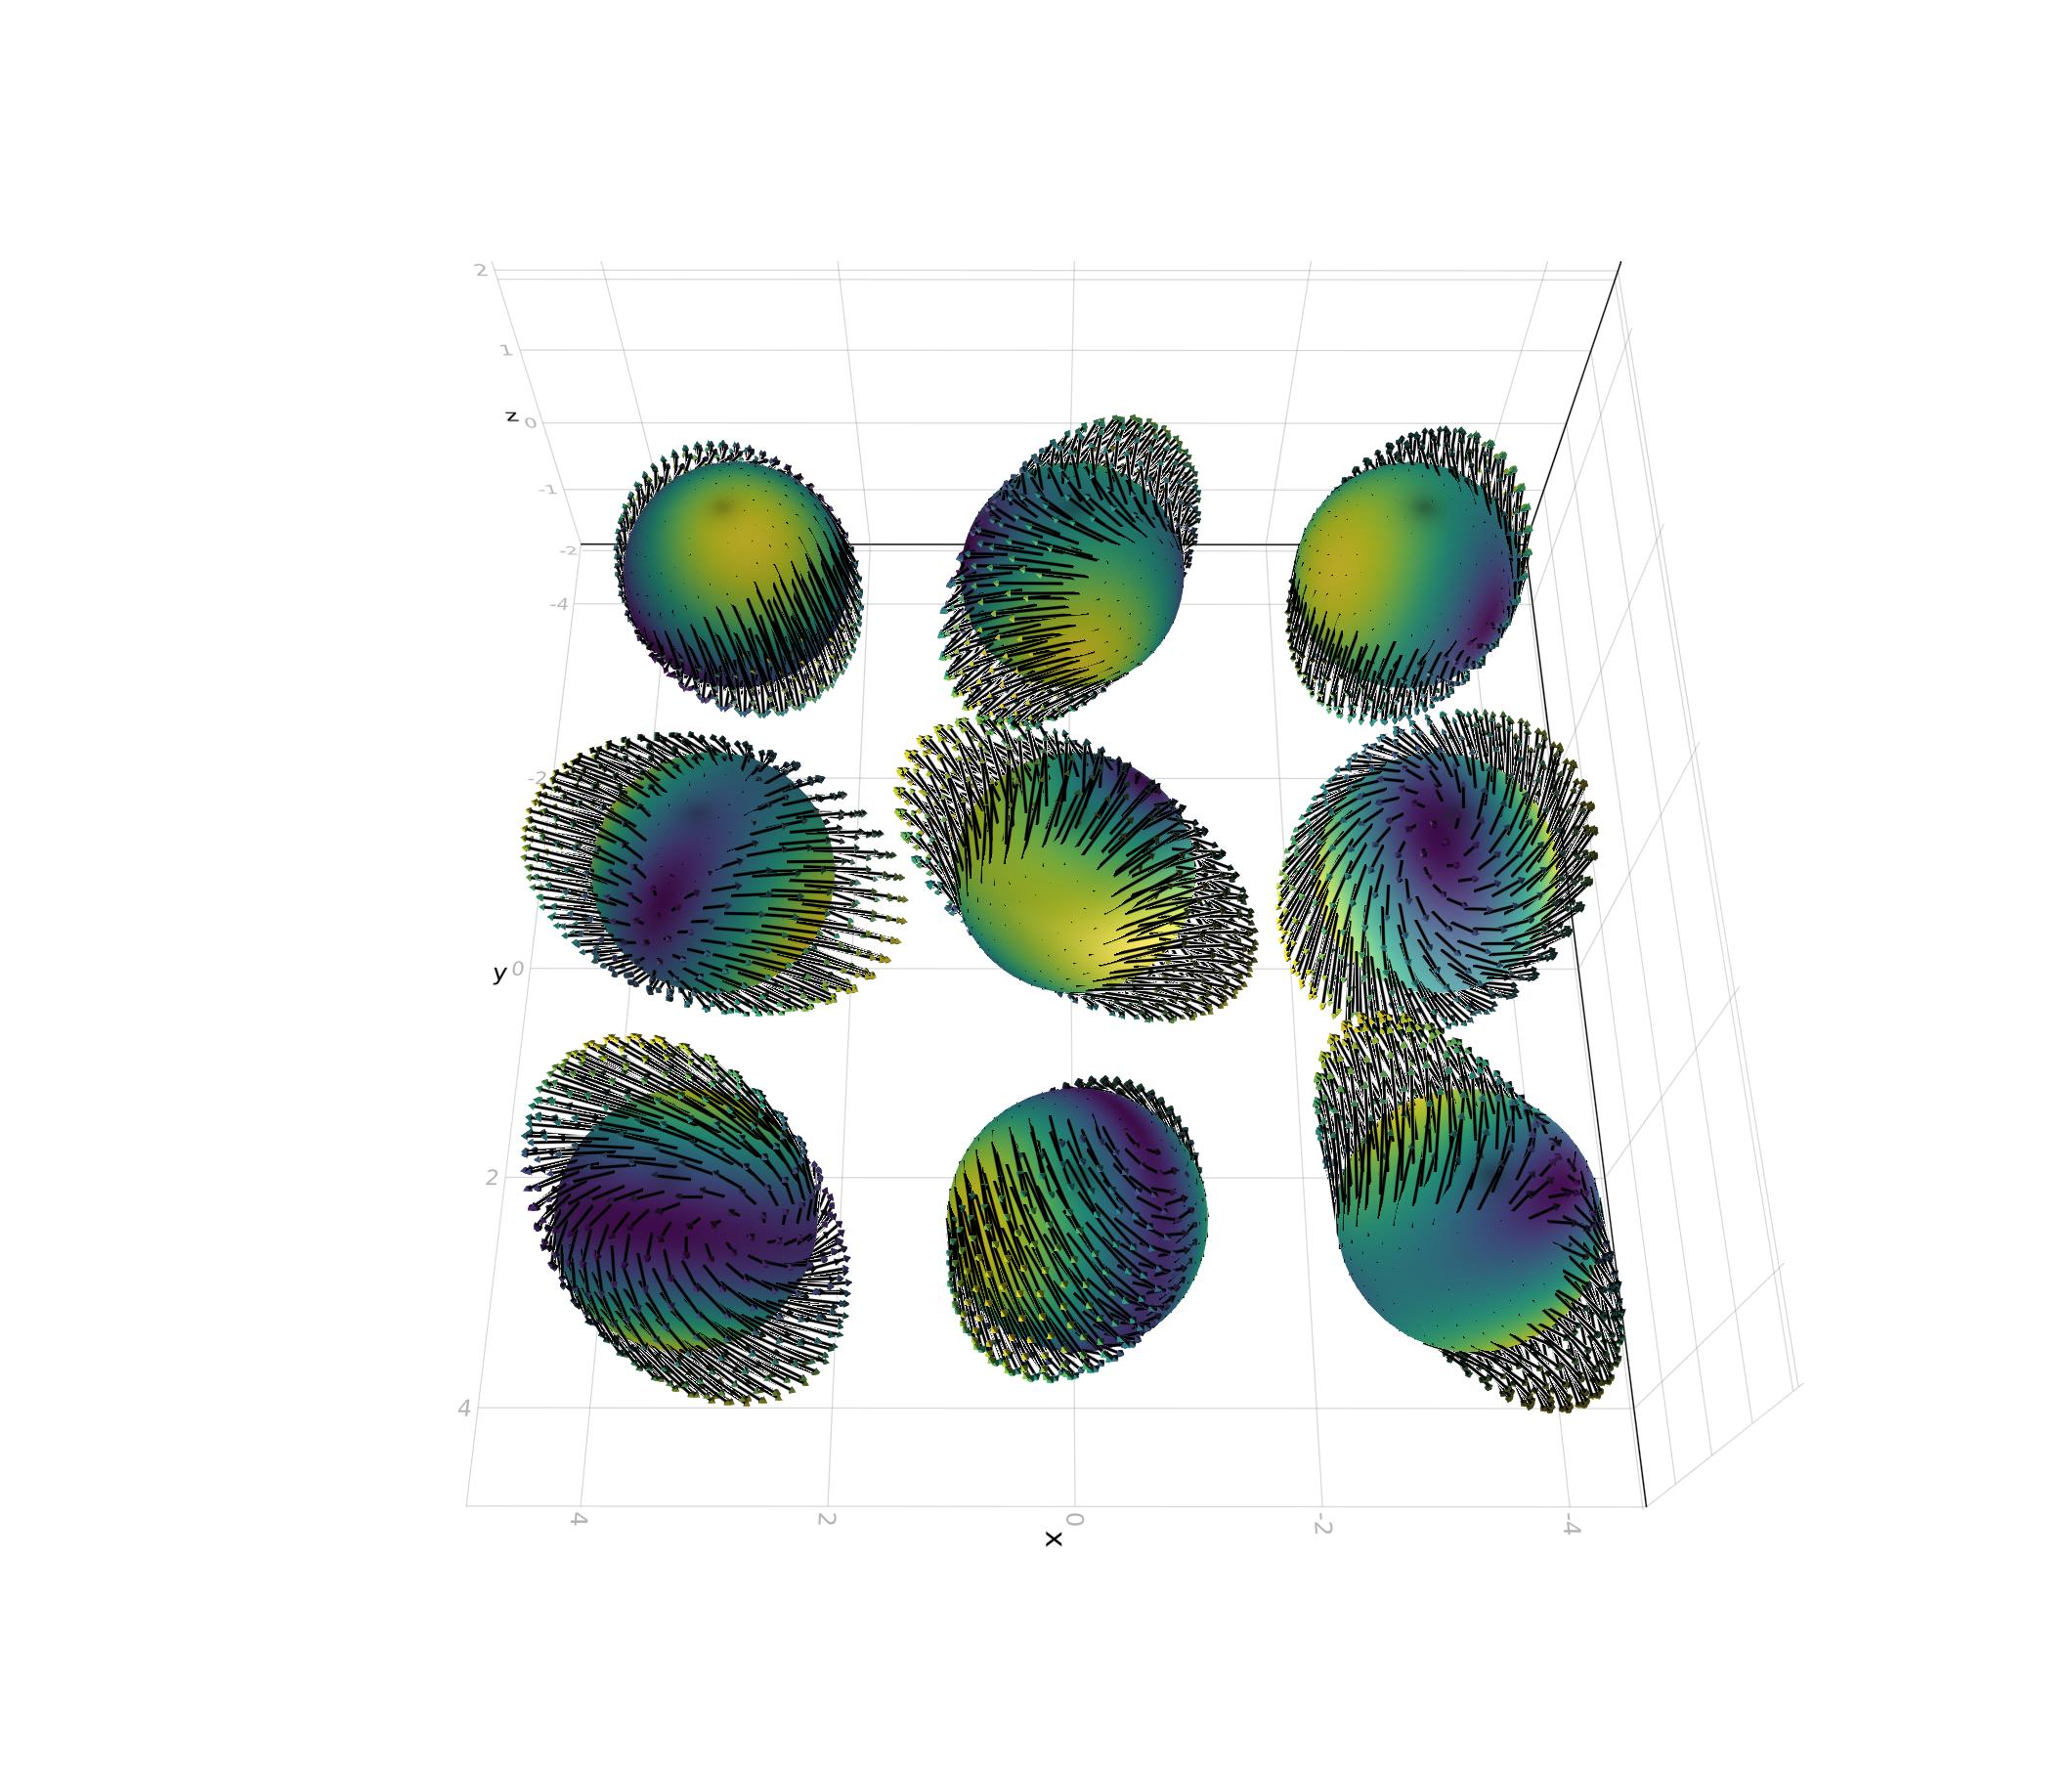 tensor3x3.png